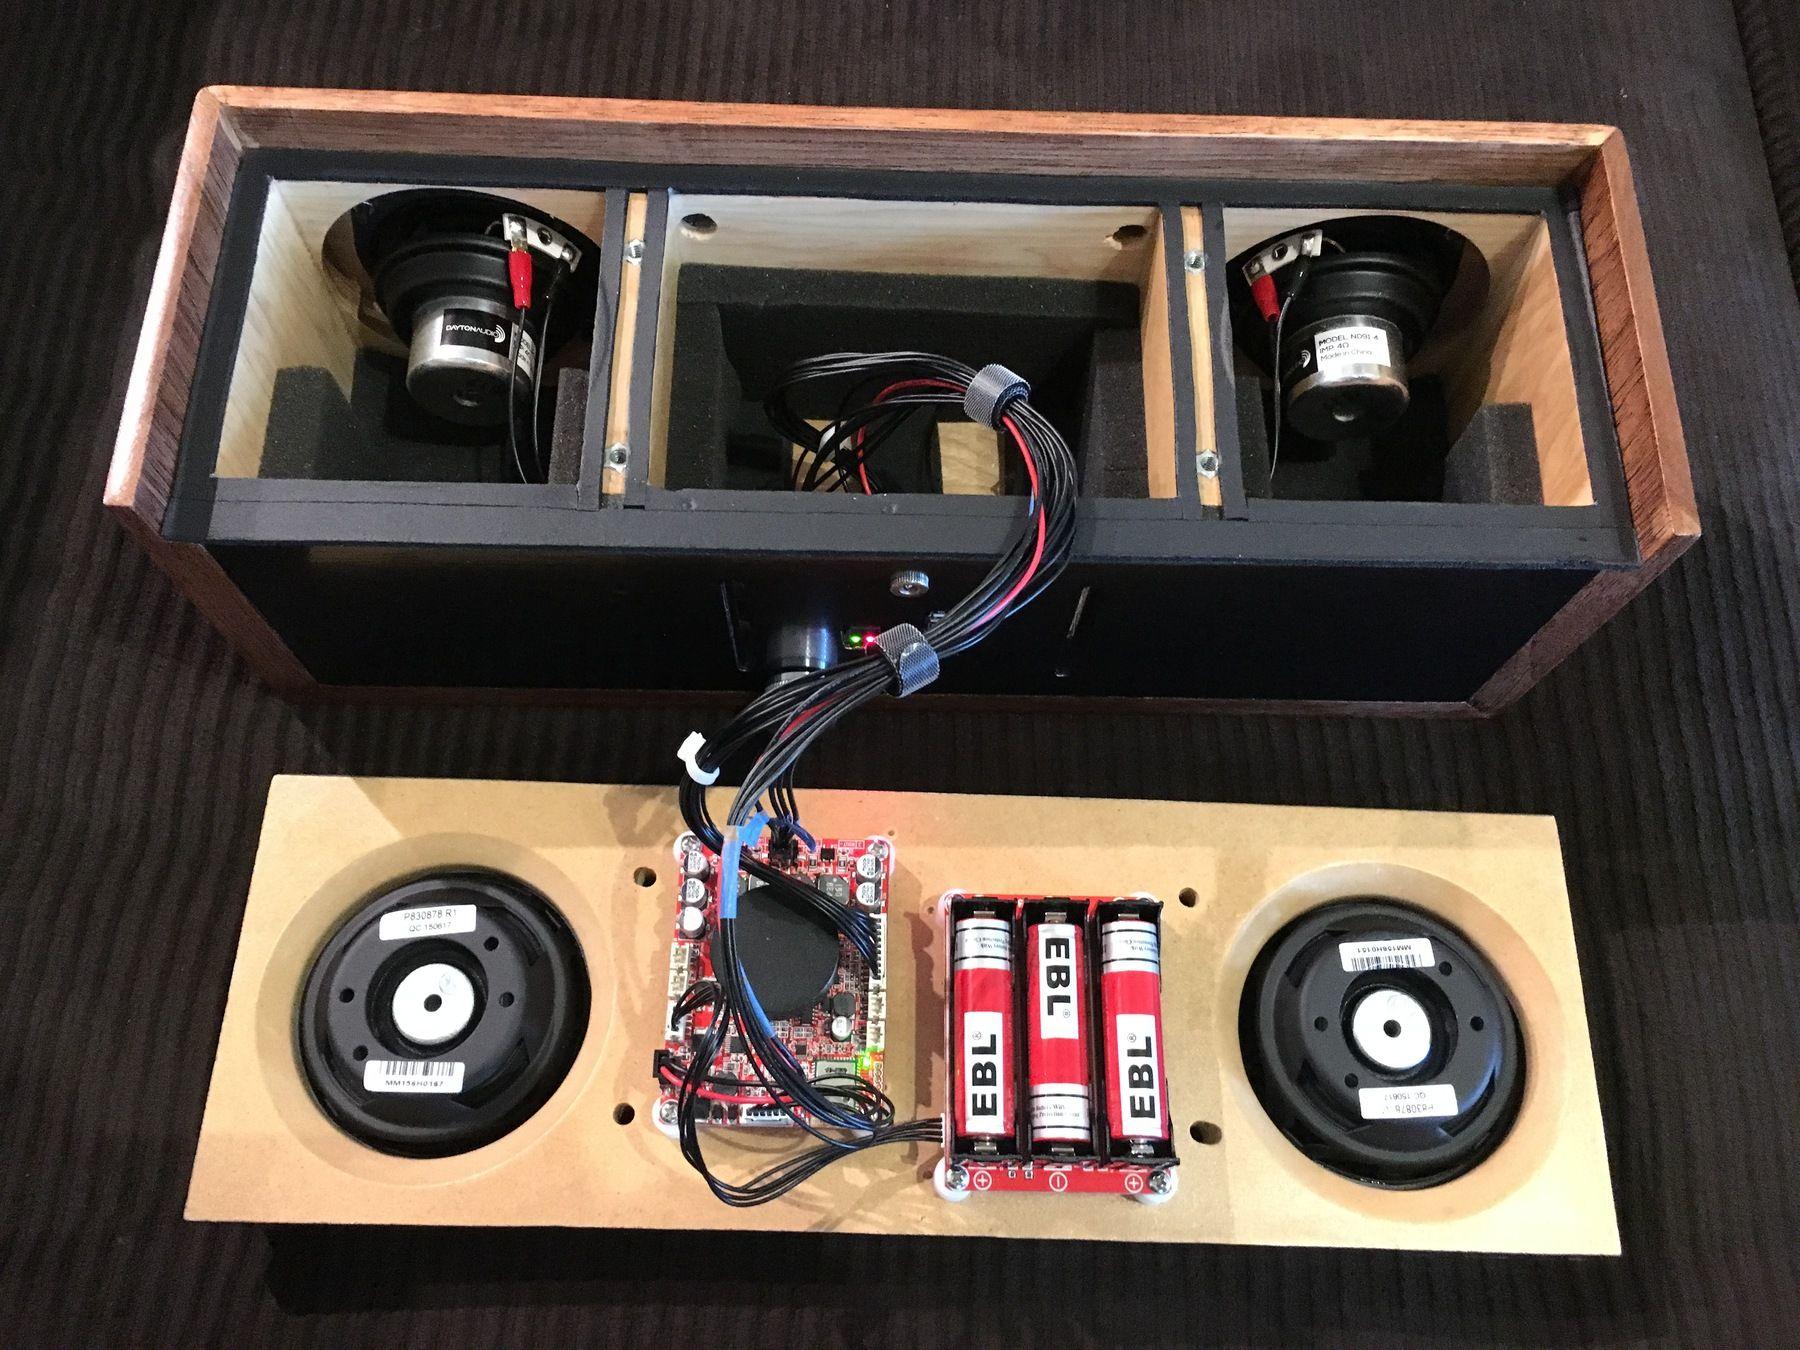 dayton audio kab 250 2x50w class d audio amplifier board with bluetooth 4 0 [ 1800 x 1350 Pixel ]